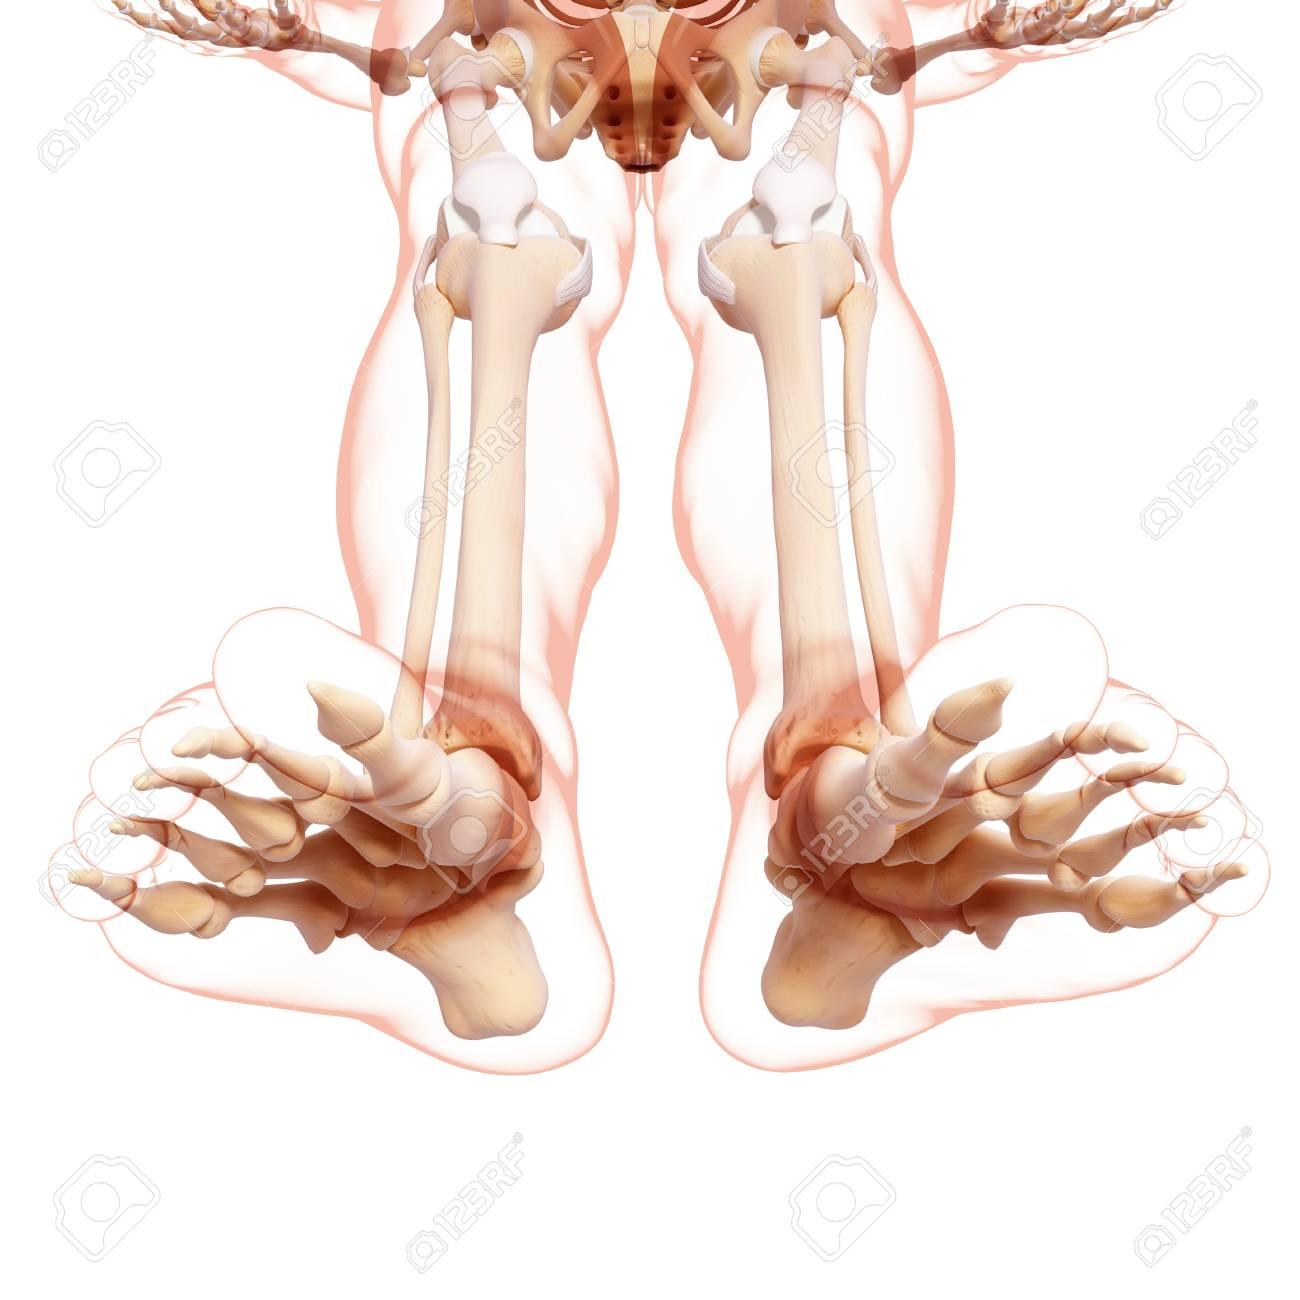 Human Leg Bonescomputer Artwork Stock Photo Picture And Royalty